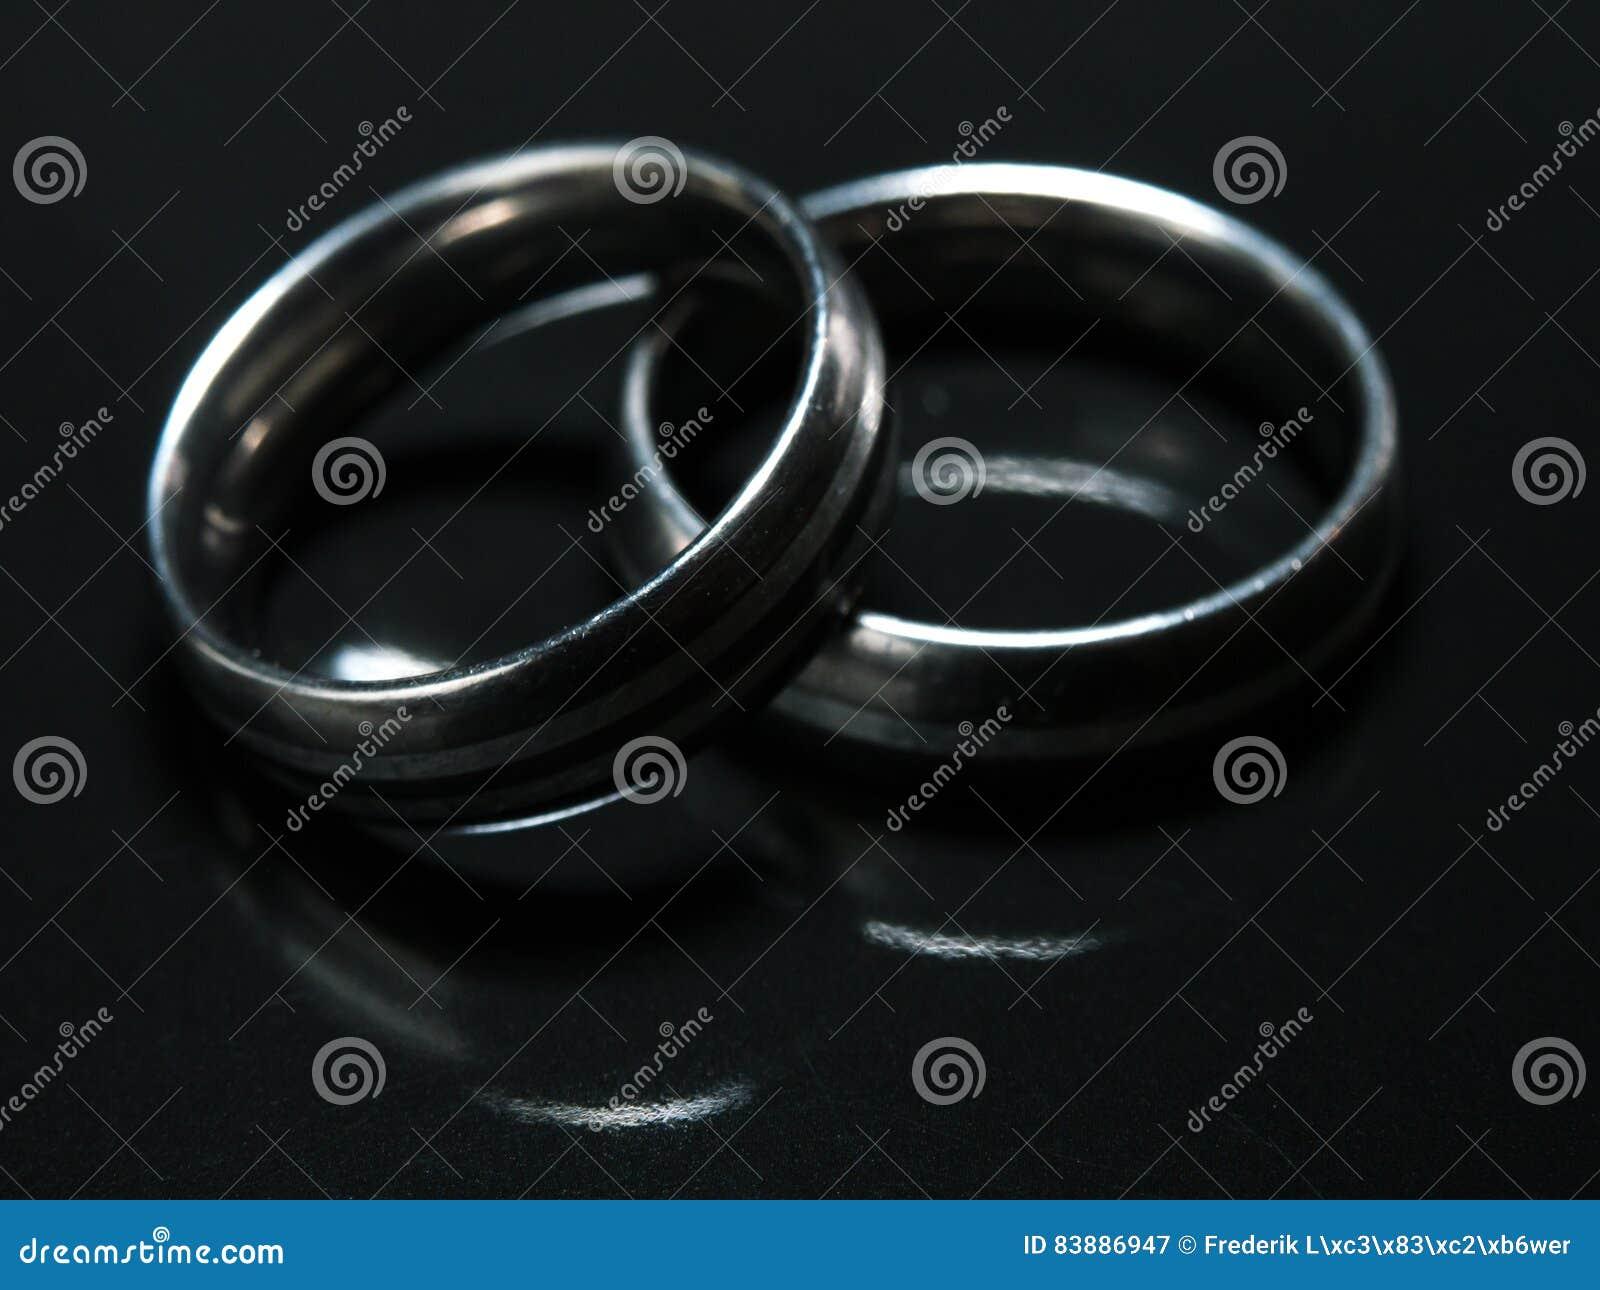 Used Wedding Rings.Two Used Wedding Rings On Black Background Stock Image Image Of